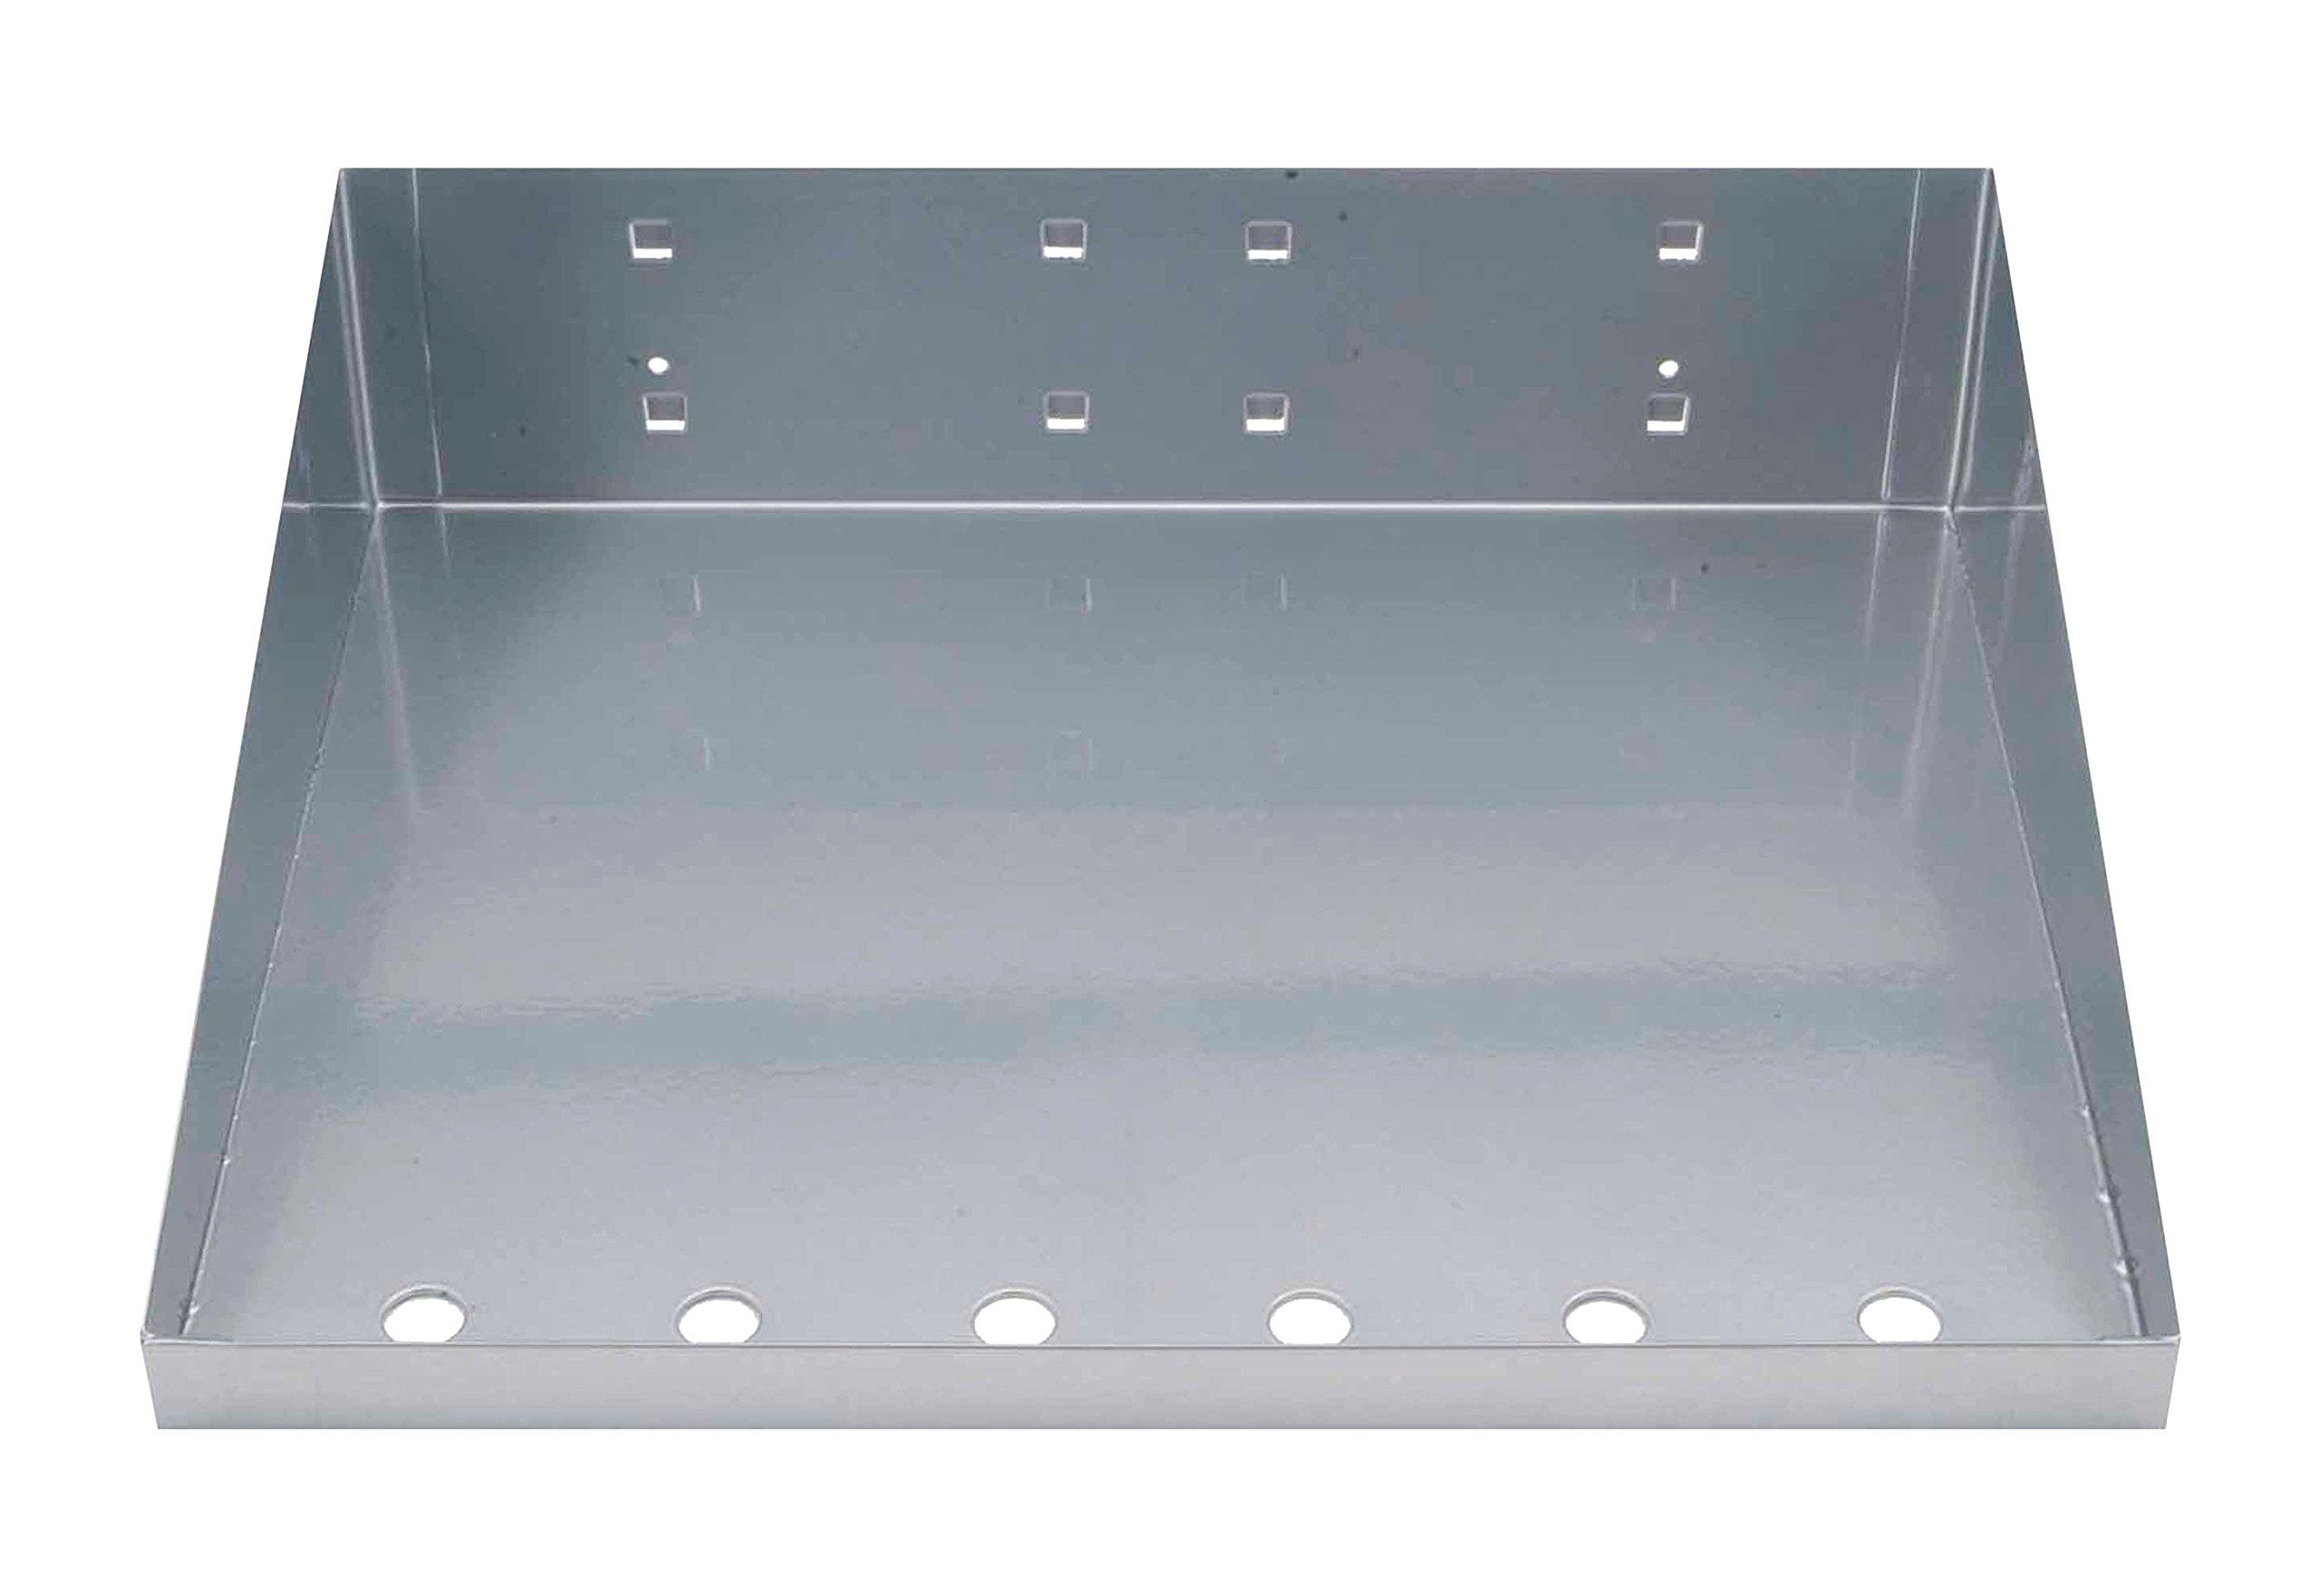 Locking Pegboard Hooks 56120-SLV LocHook Shelf with Garment Hanger, 12'' x 10'', Silver